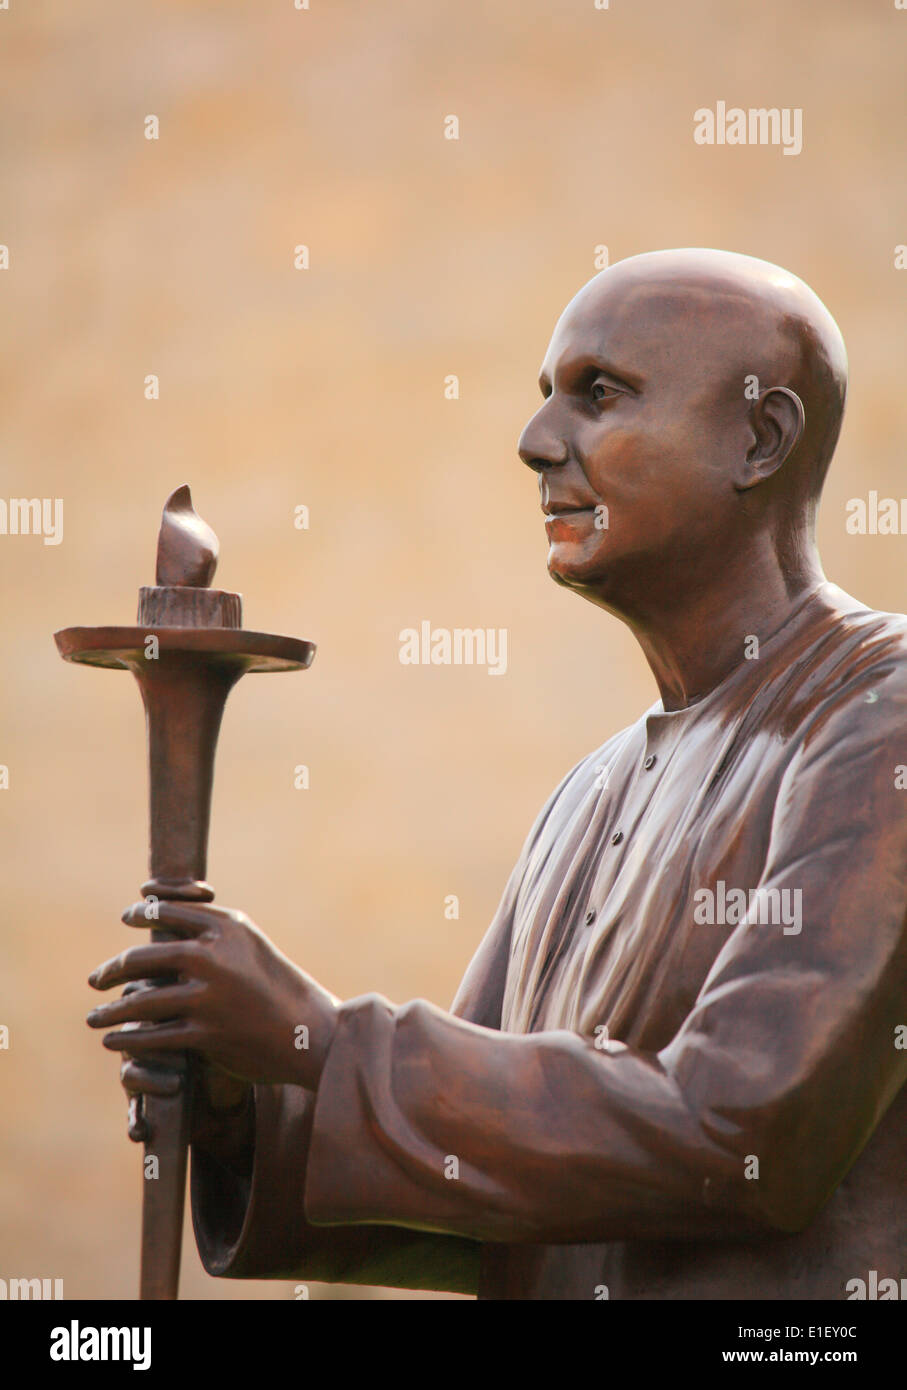 Royaume-uni, Pays de Galles, Cardiff, Bay, l'harmonie mondiale, Peace Statue Photo Stock